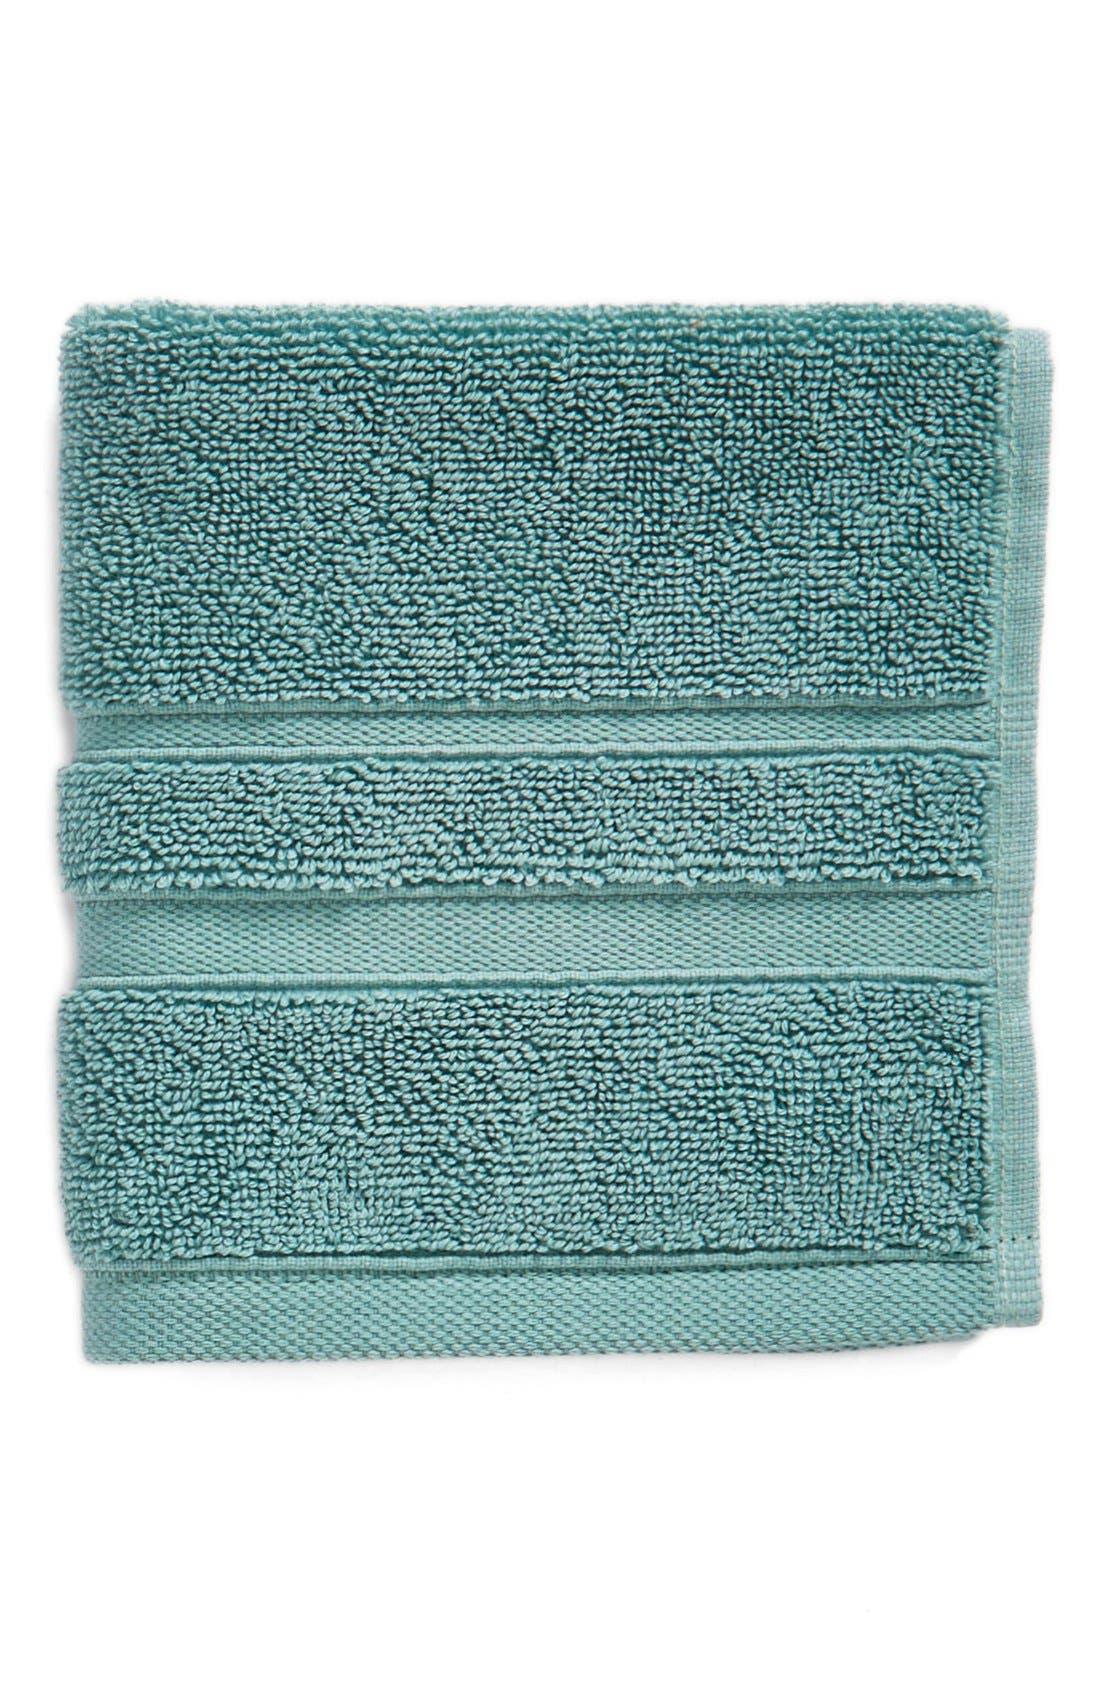 Waterworks Studio 'Perennial' Combed Turkish Cotton Washcloth (Online Only)